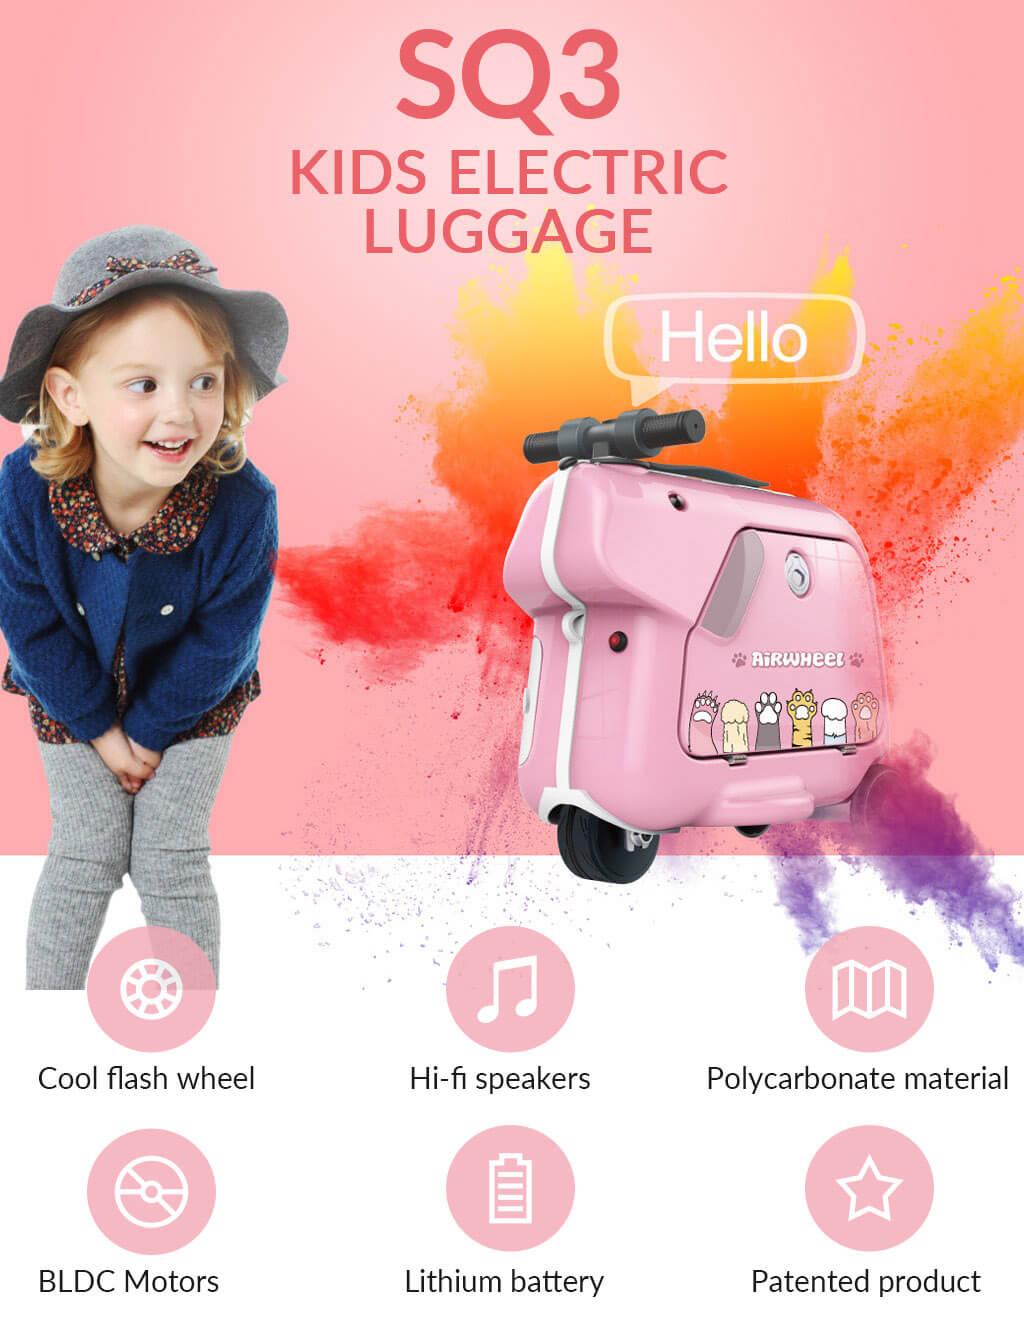 Airwheel SQ3 Kids smart music suitcase